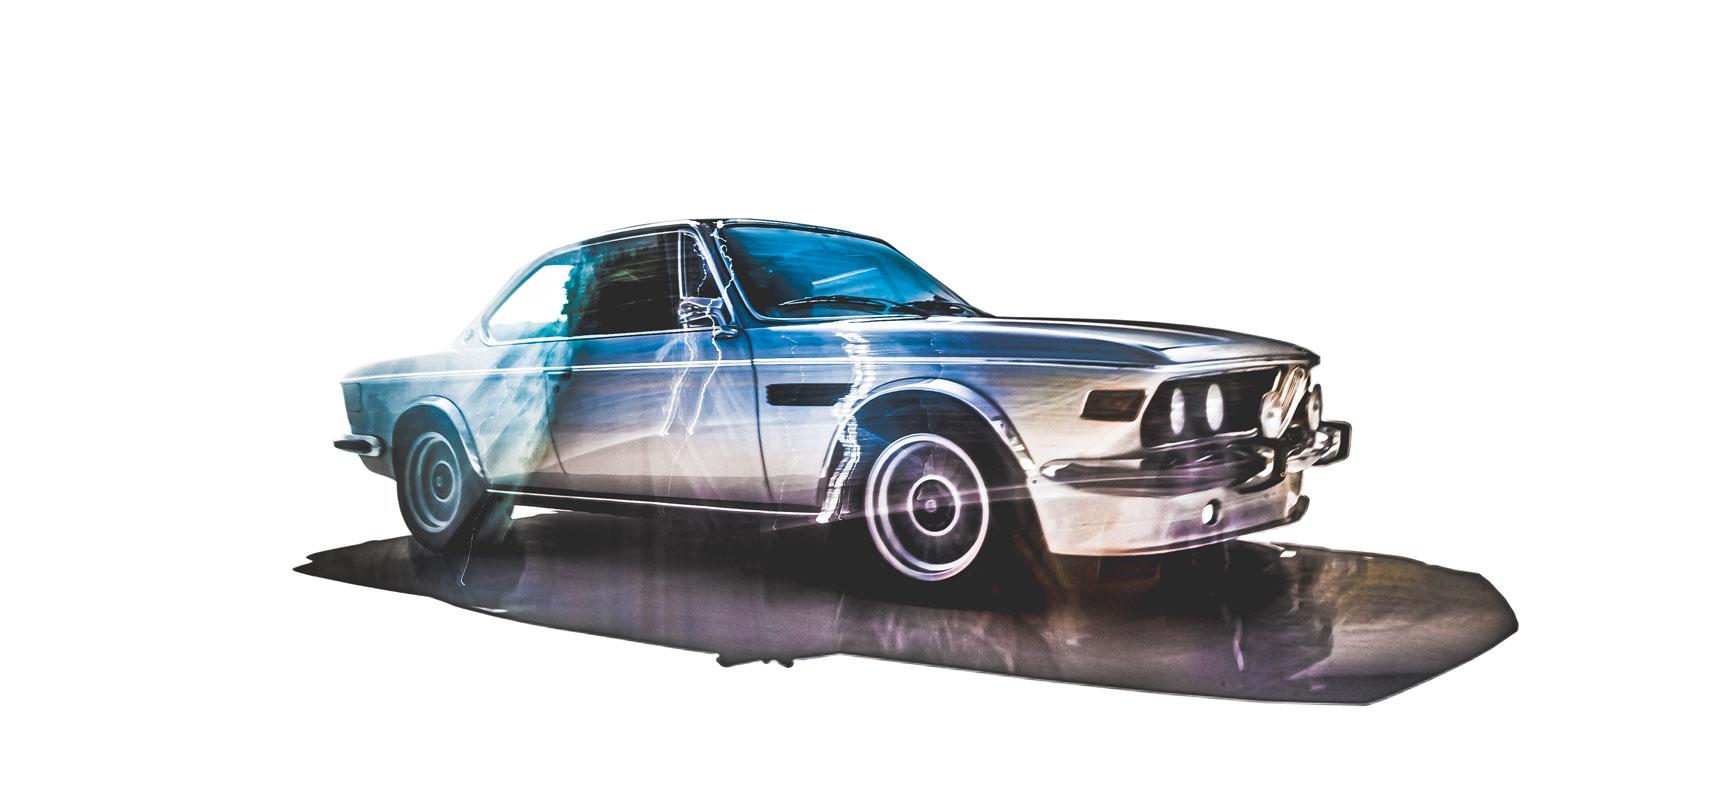 BMW-CSI-by-axelkoenig-kamera